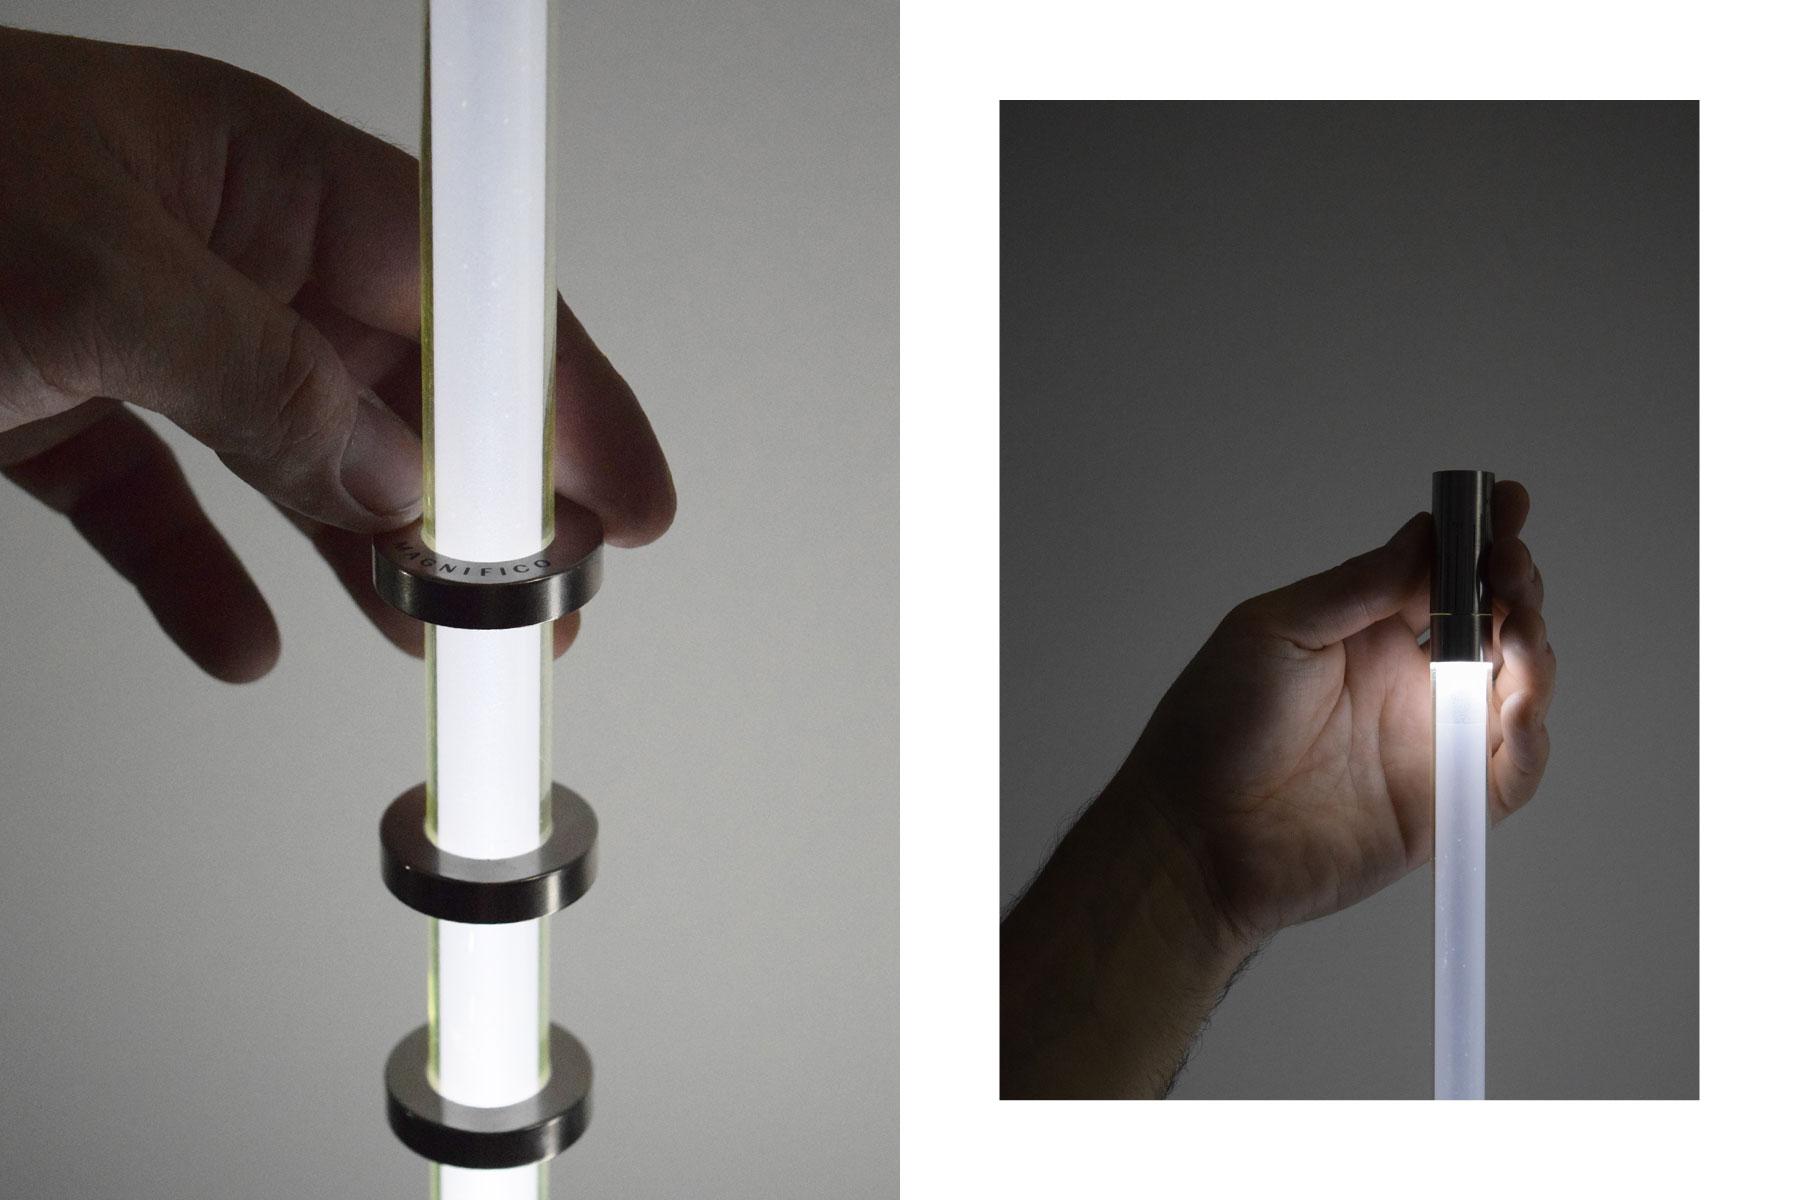 Lampa-MAGNIFICO-03.jpg